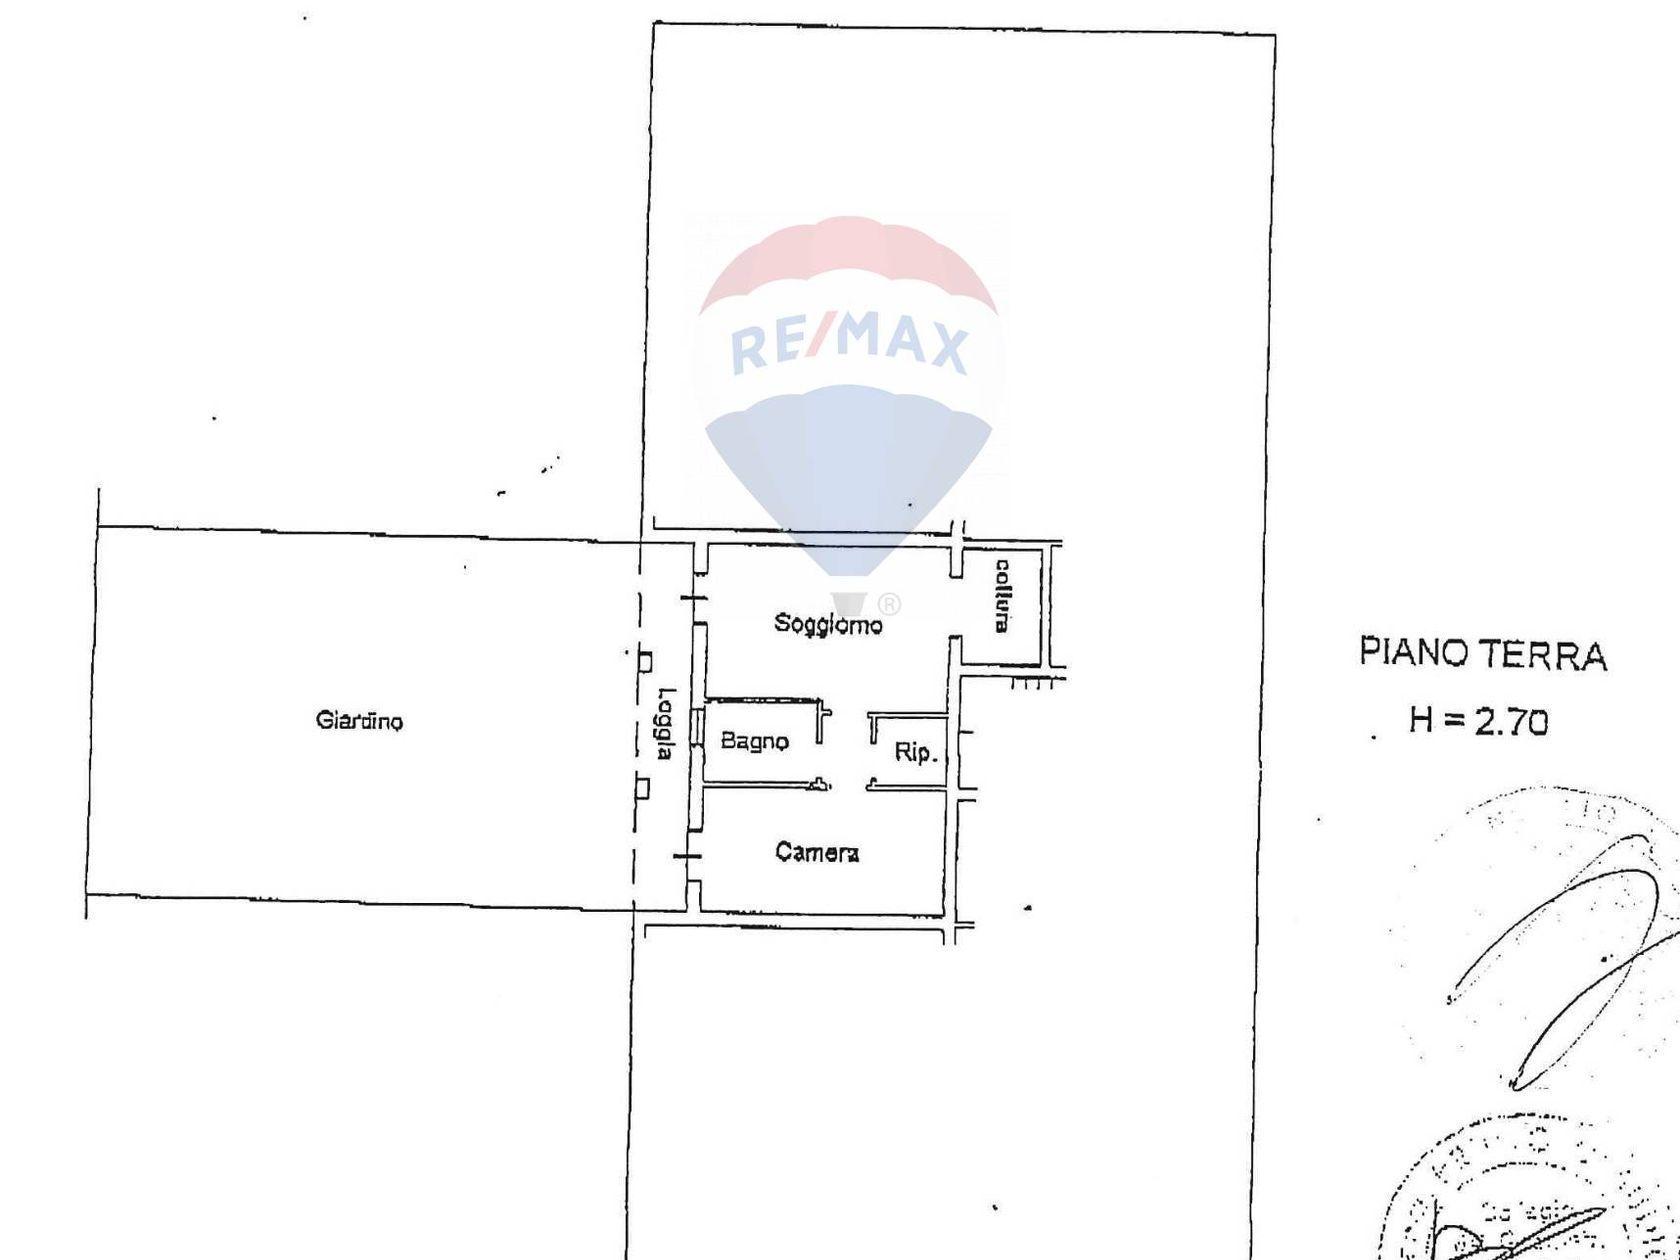 Appartamento Cantarana, Cona, VE Vendita - Planimetria 1